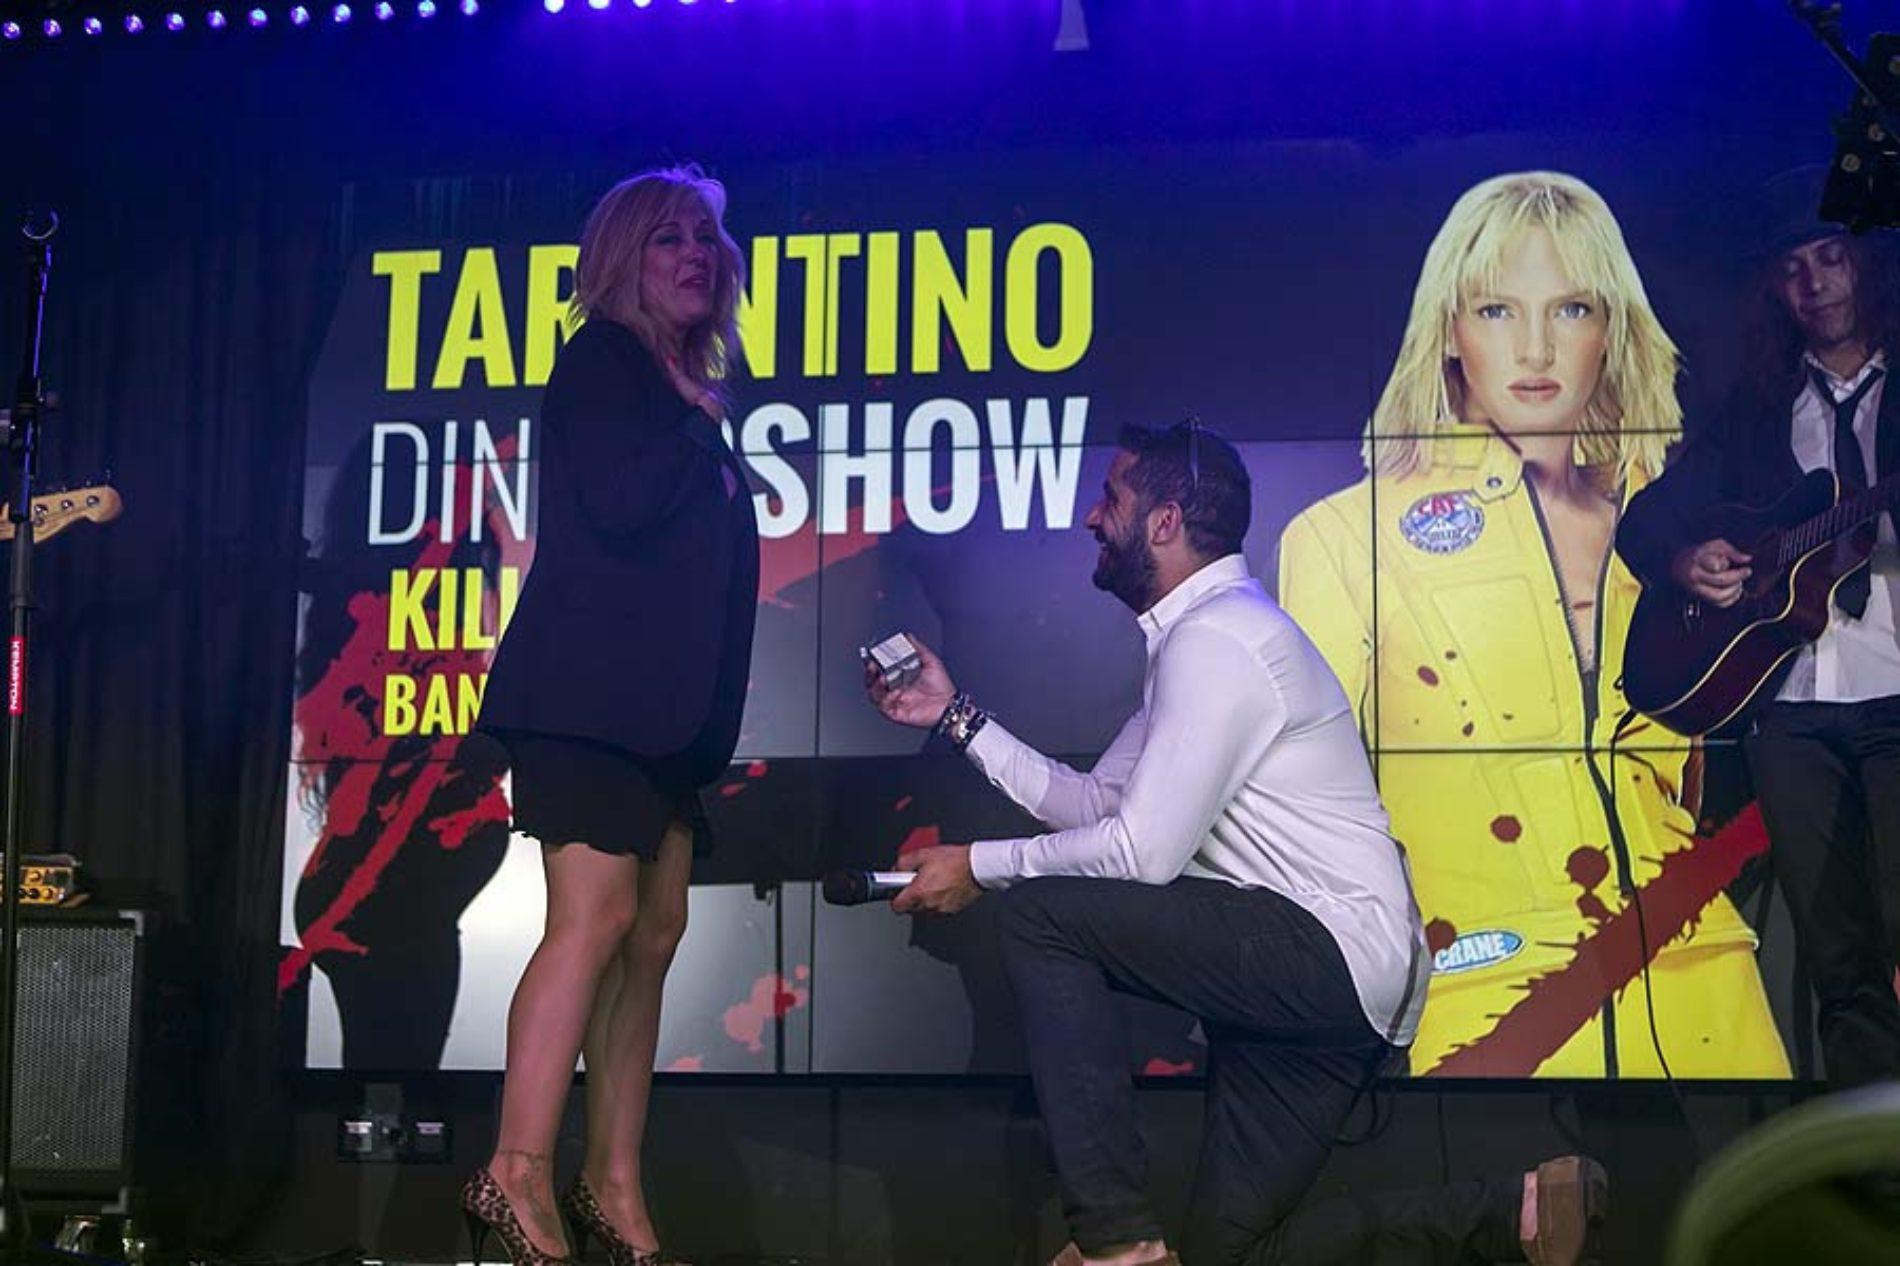 Tarantino Dinner Show 210619